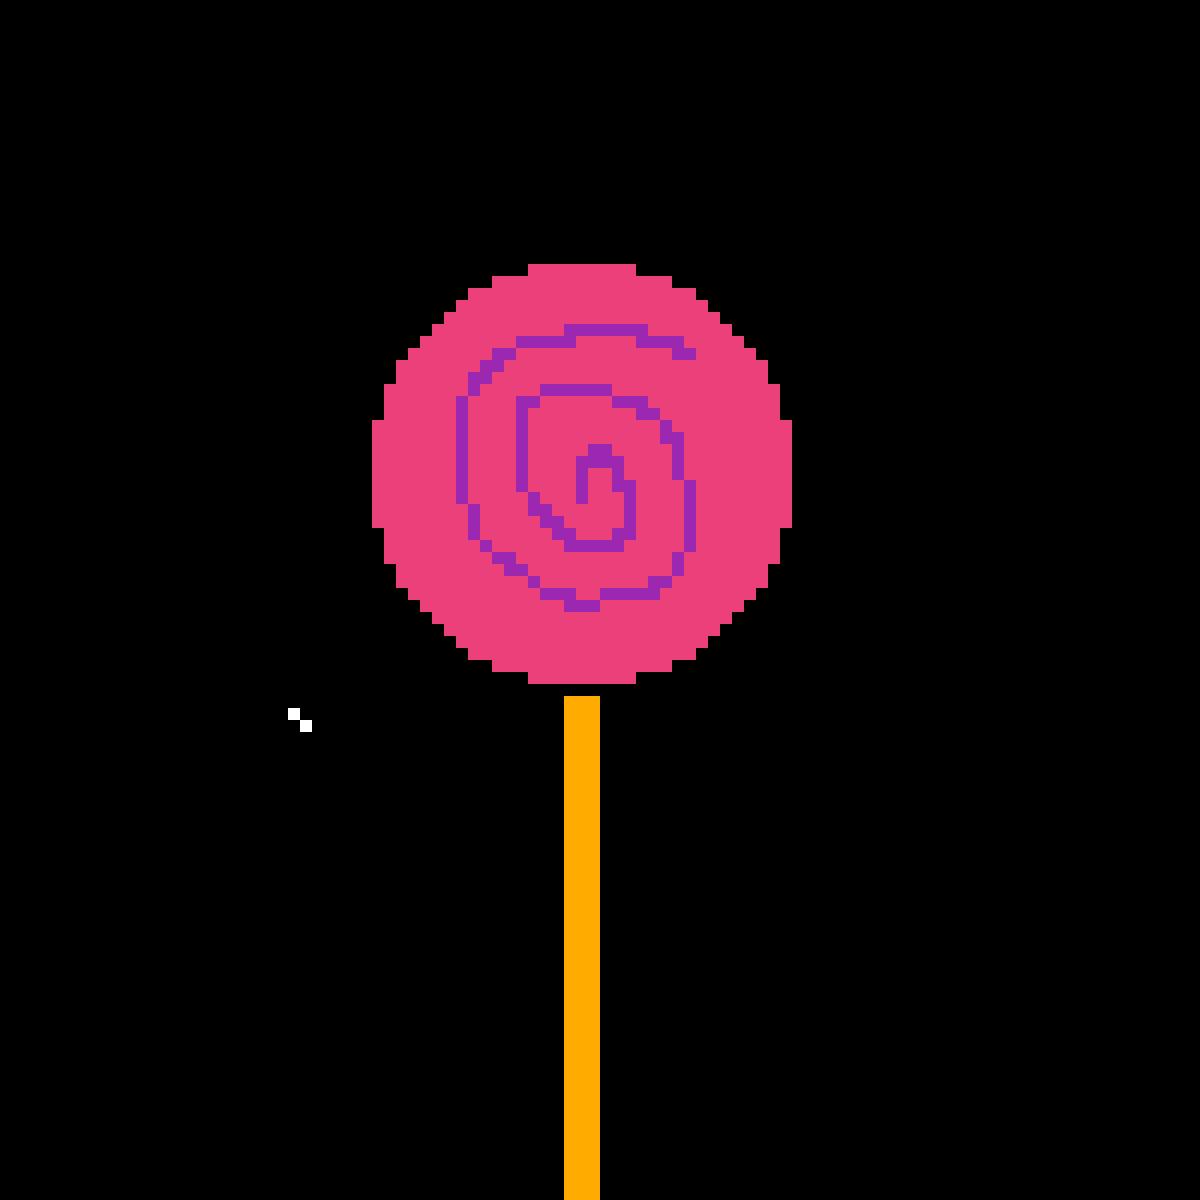 Lollipop by Clogan20